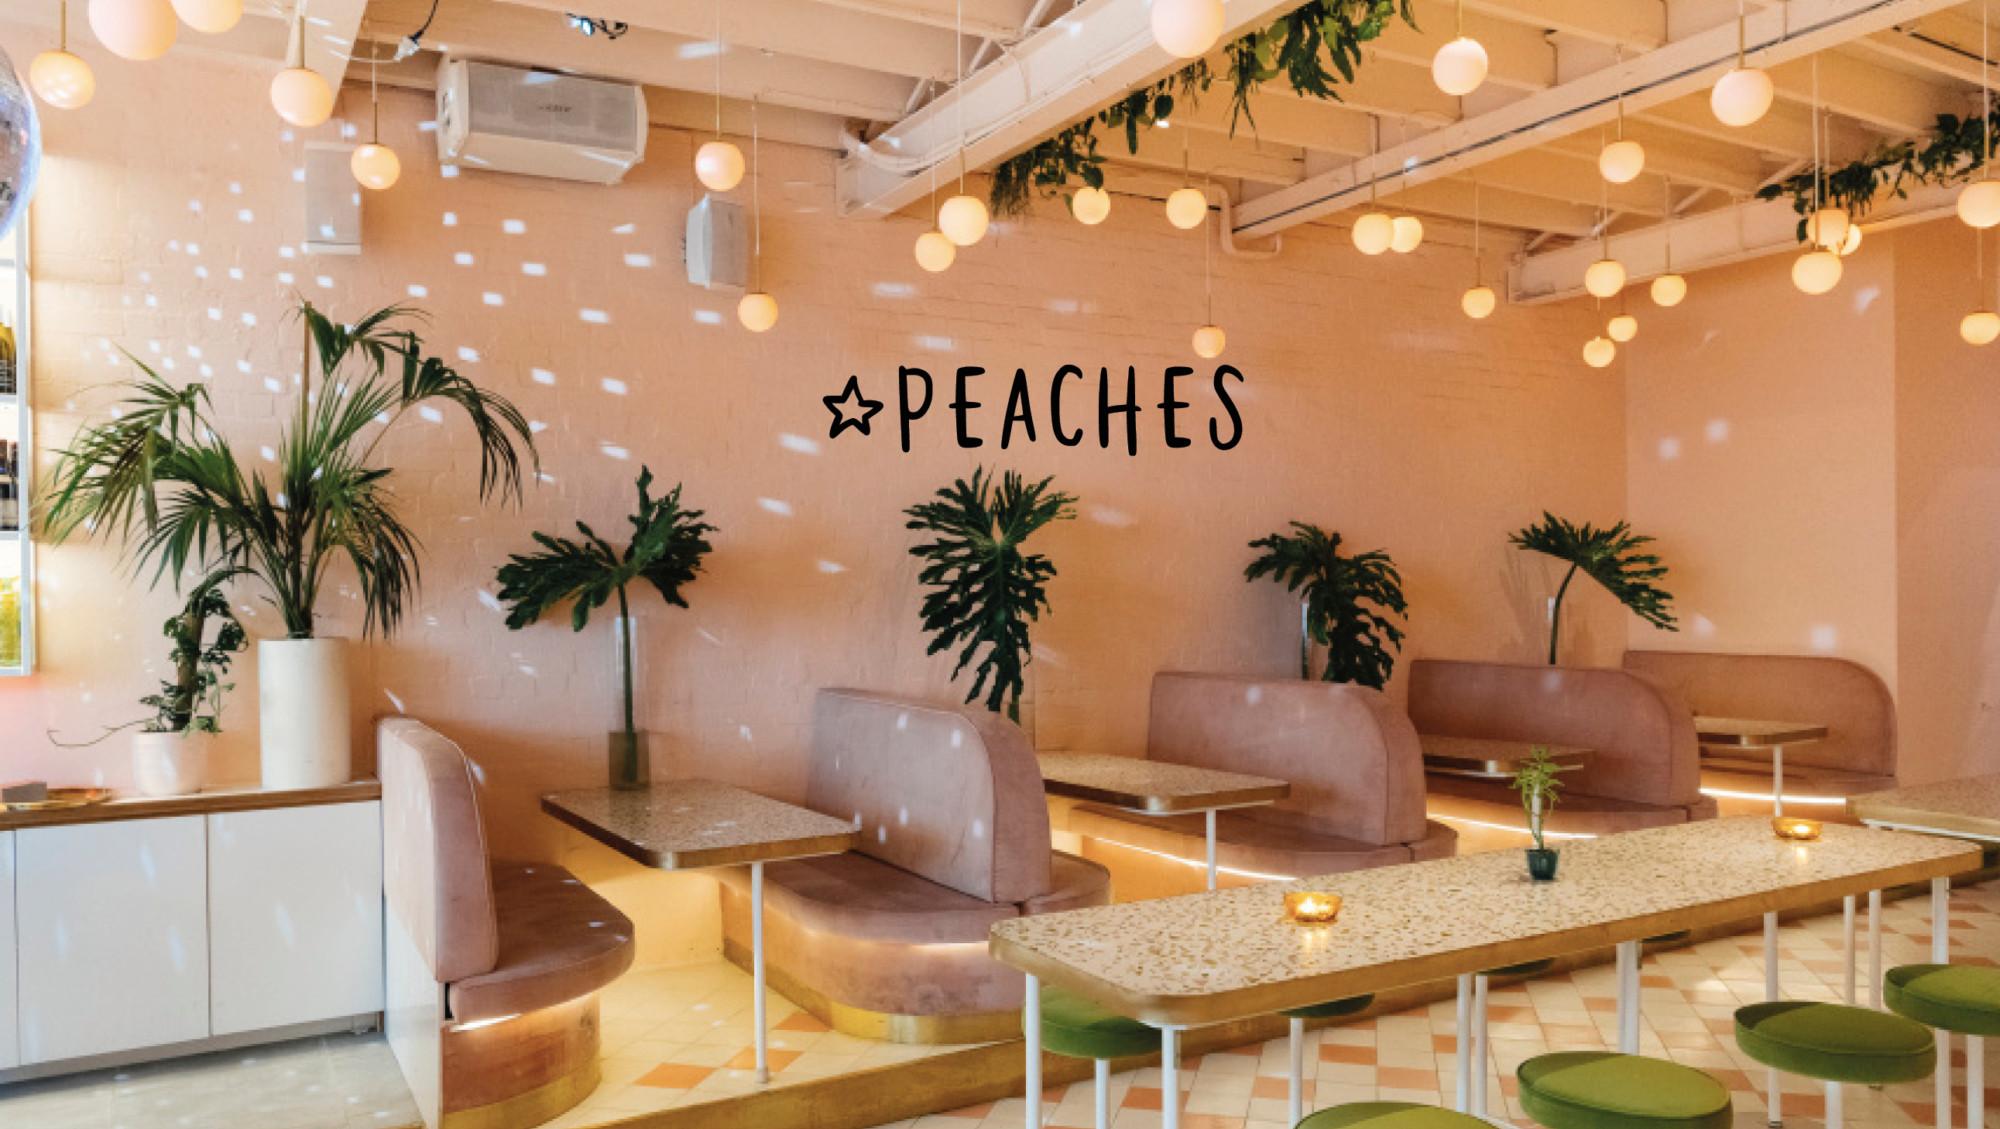 restaurant peaches met roze goals interieur groene barkrukken rooftop bar in melbourne australia